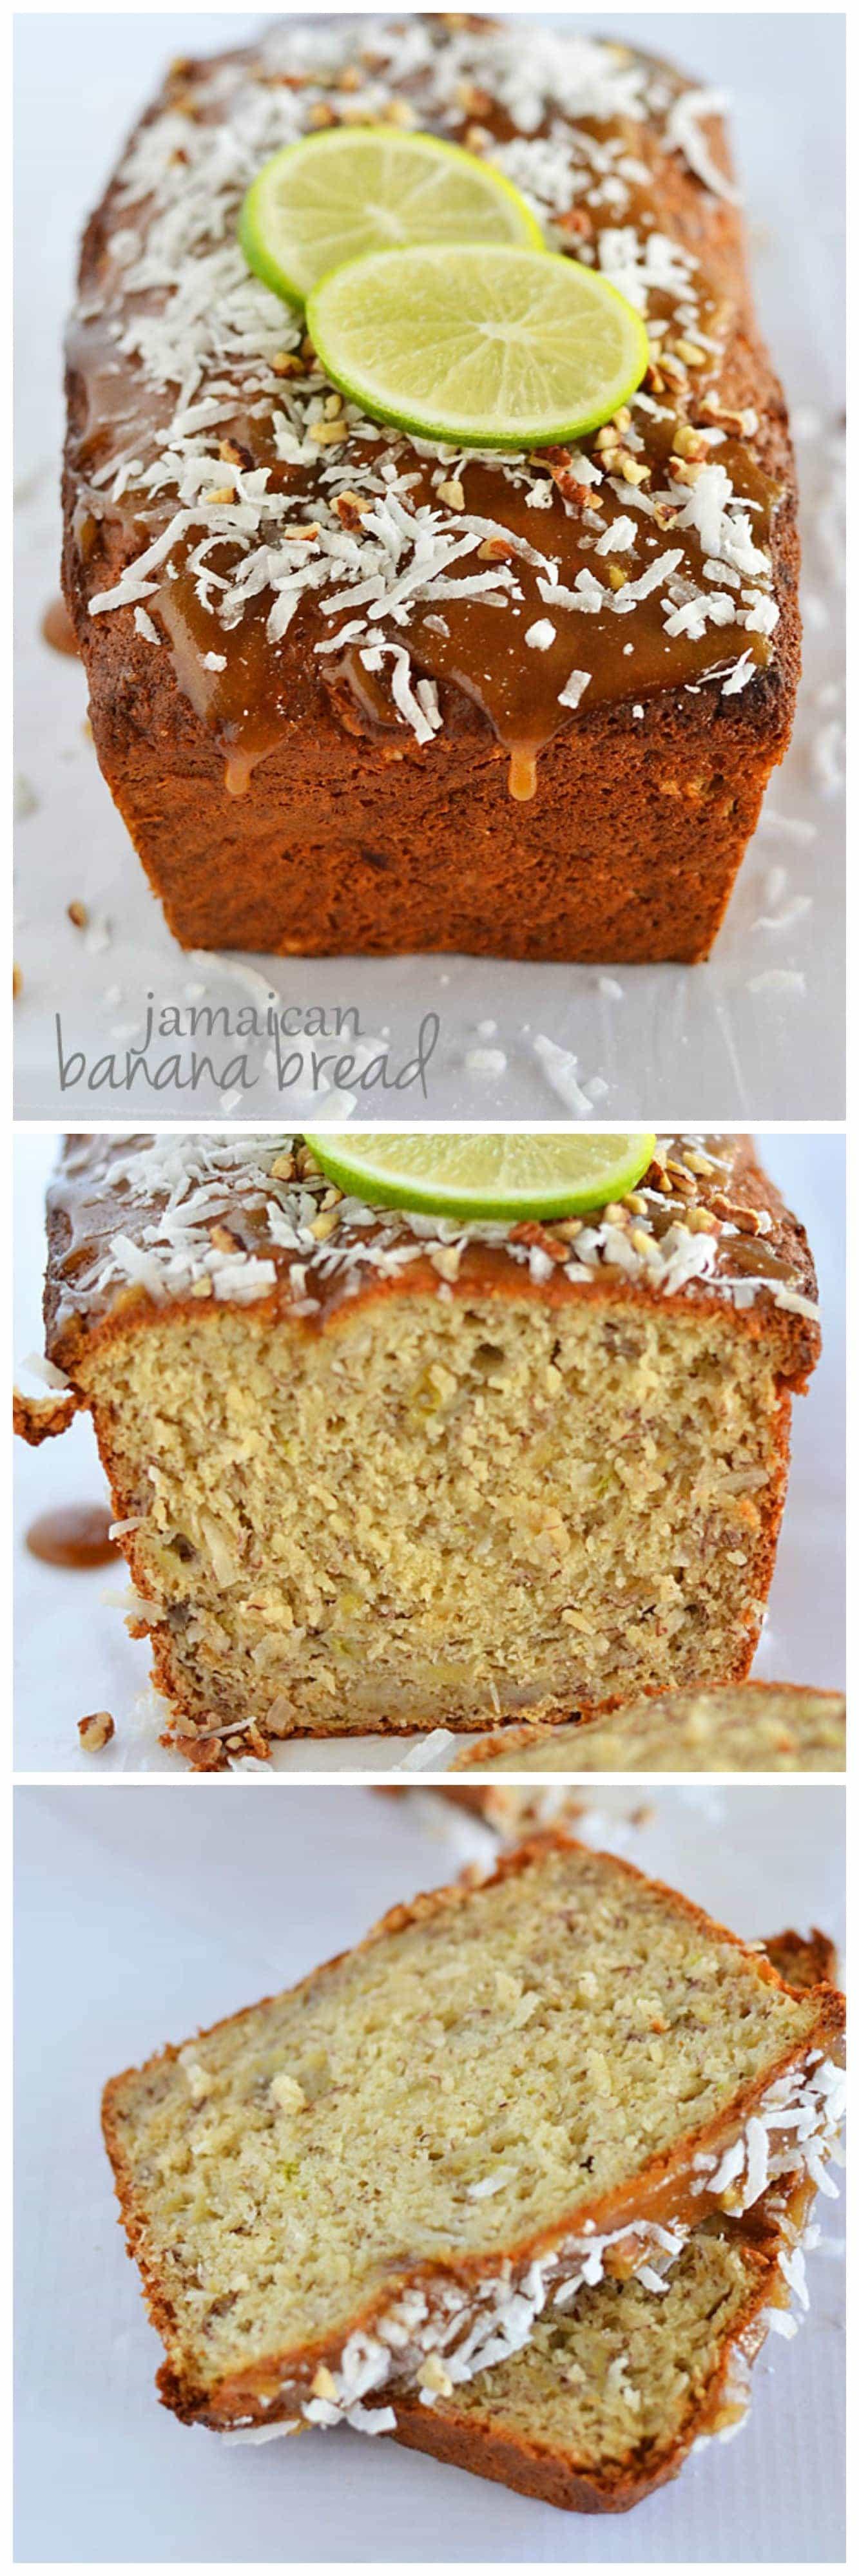 Easy jamaican banana cake recipe delicious jamaican banana bread banana bread recipe bbc food forumfinder Choice Image